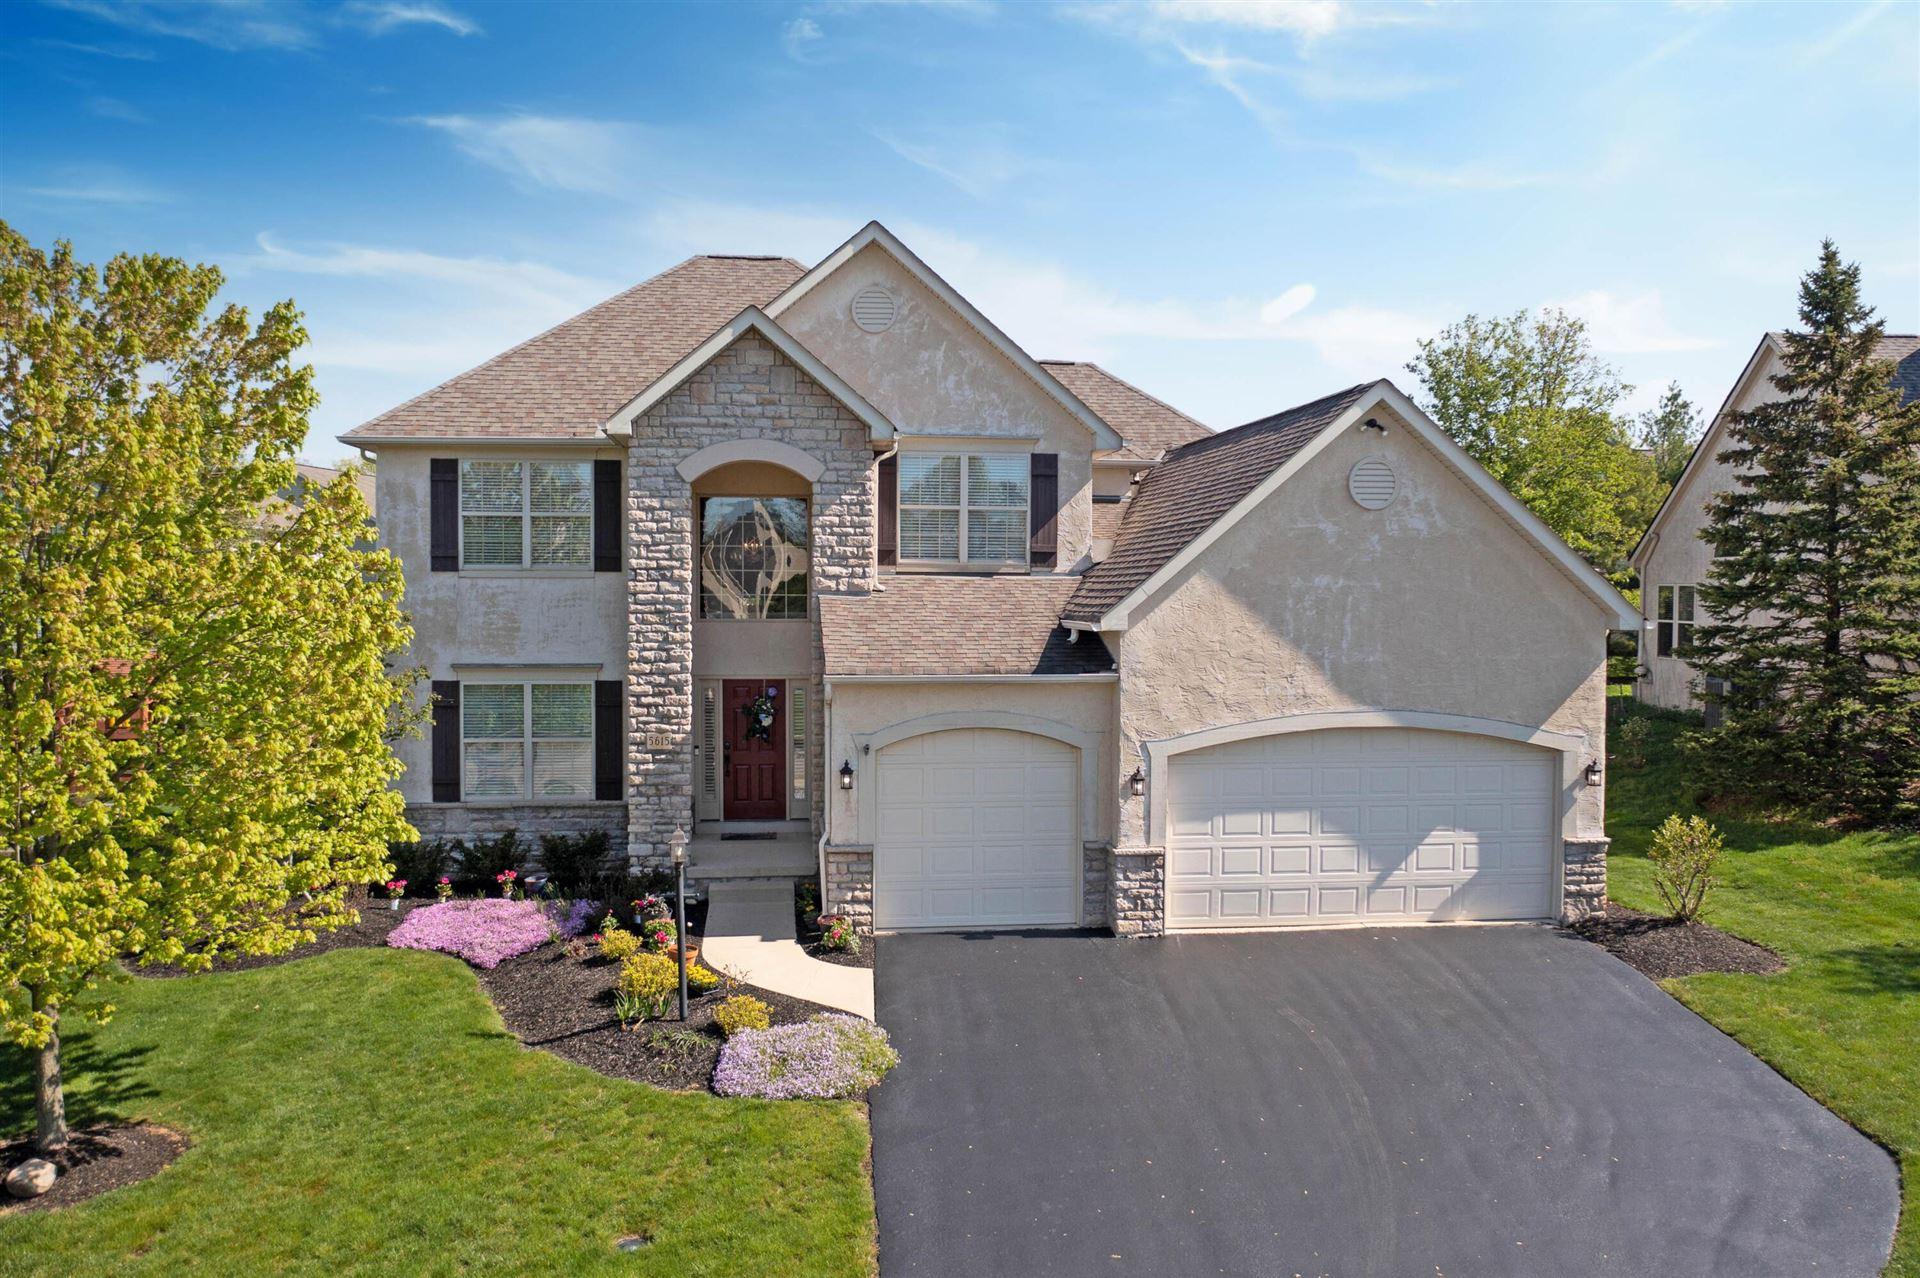 Photo of 5615 Dorshire Drive, Galena, OH 43021 (MLS # 221014146)